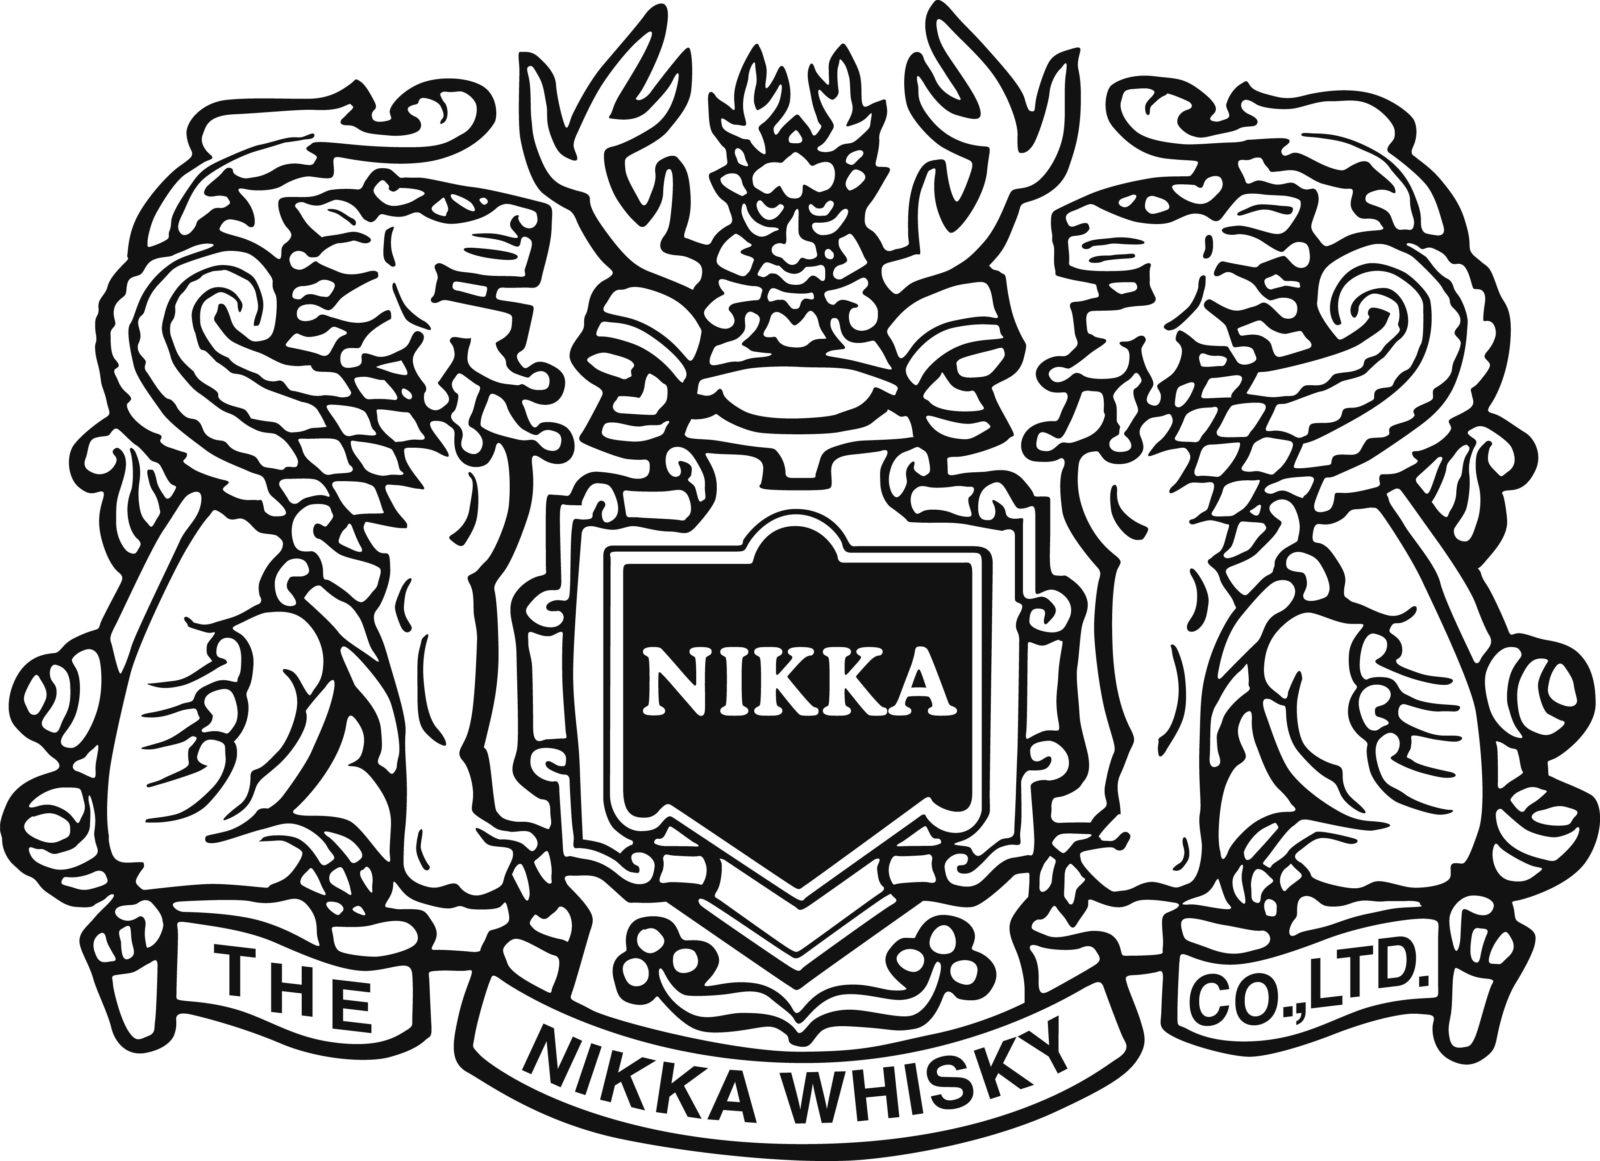 Nikka Whiskies